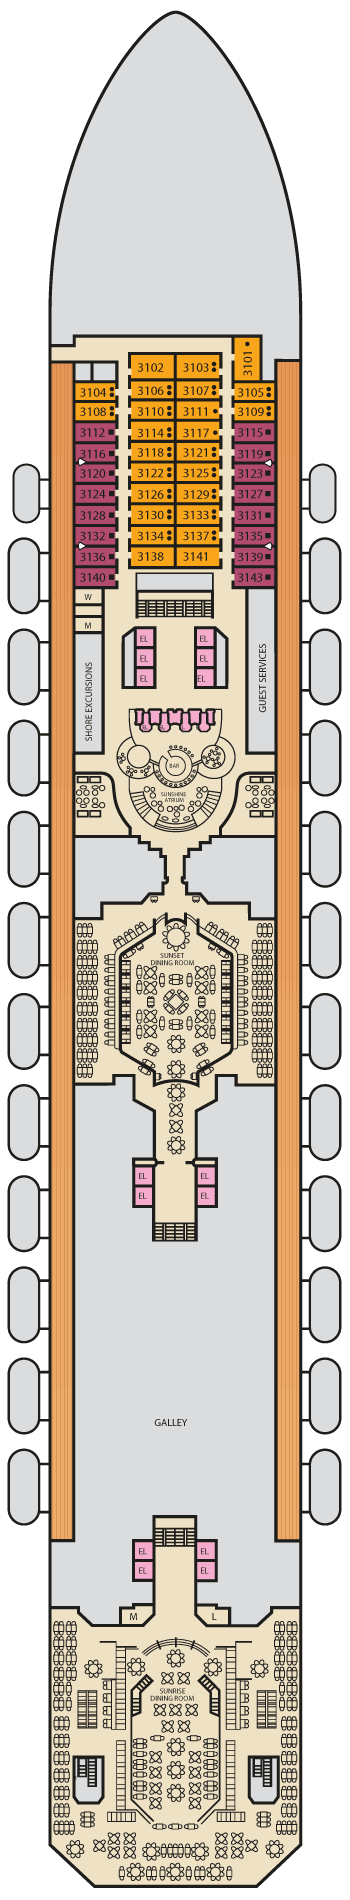 Carnival Sunshine - Lobby Deck